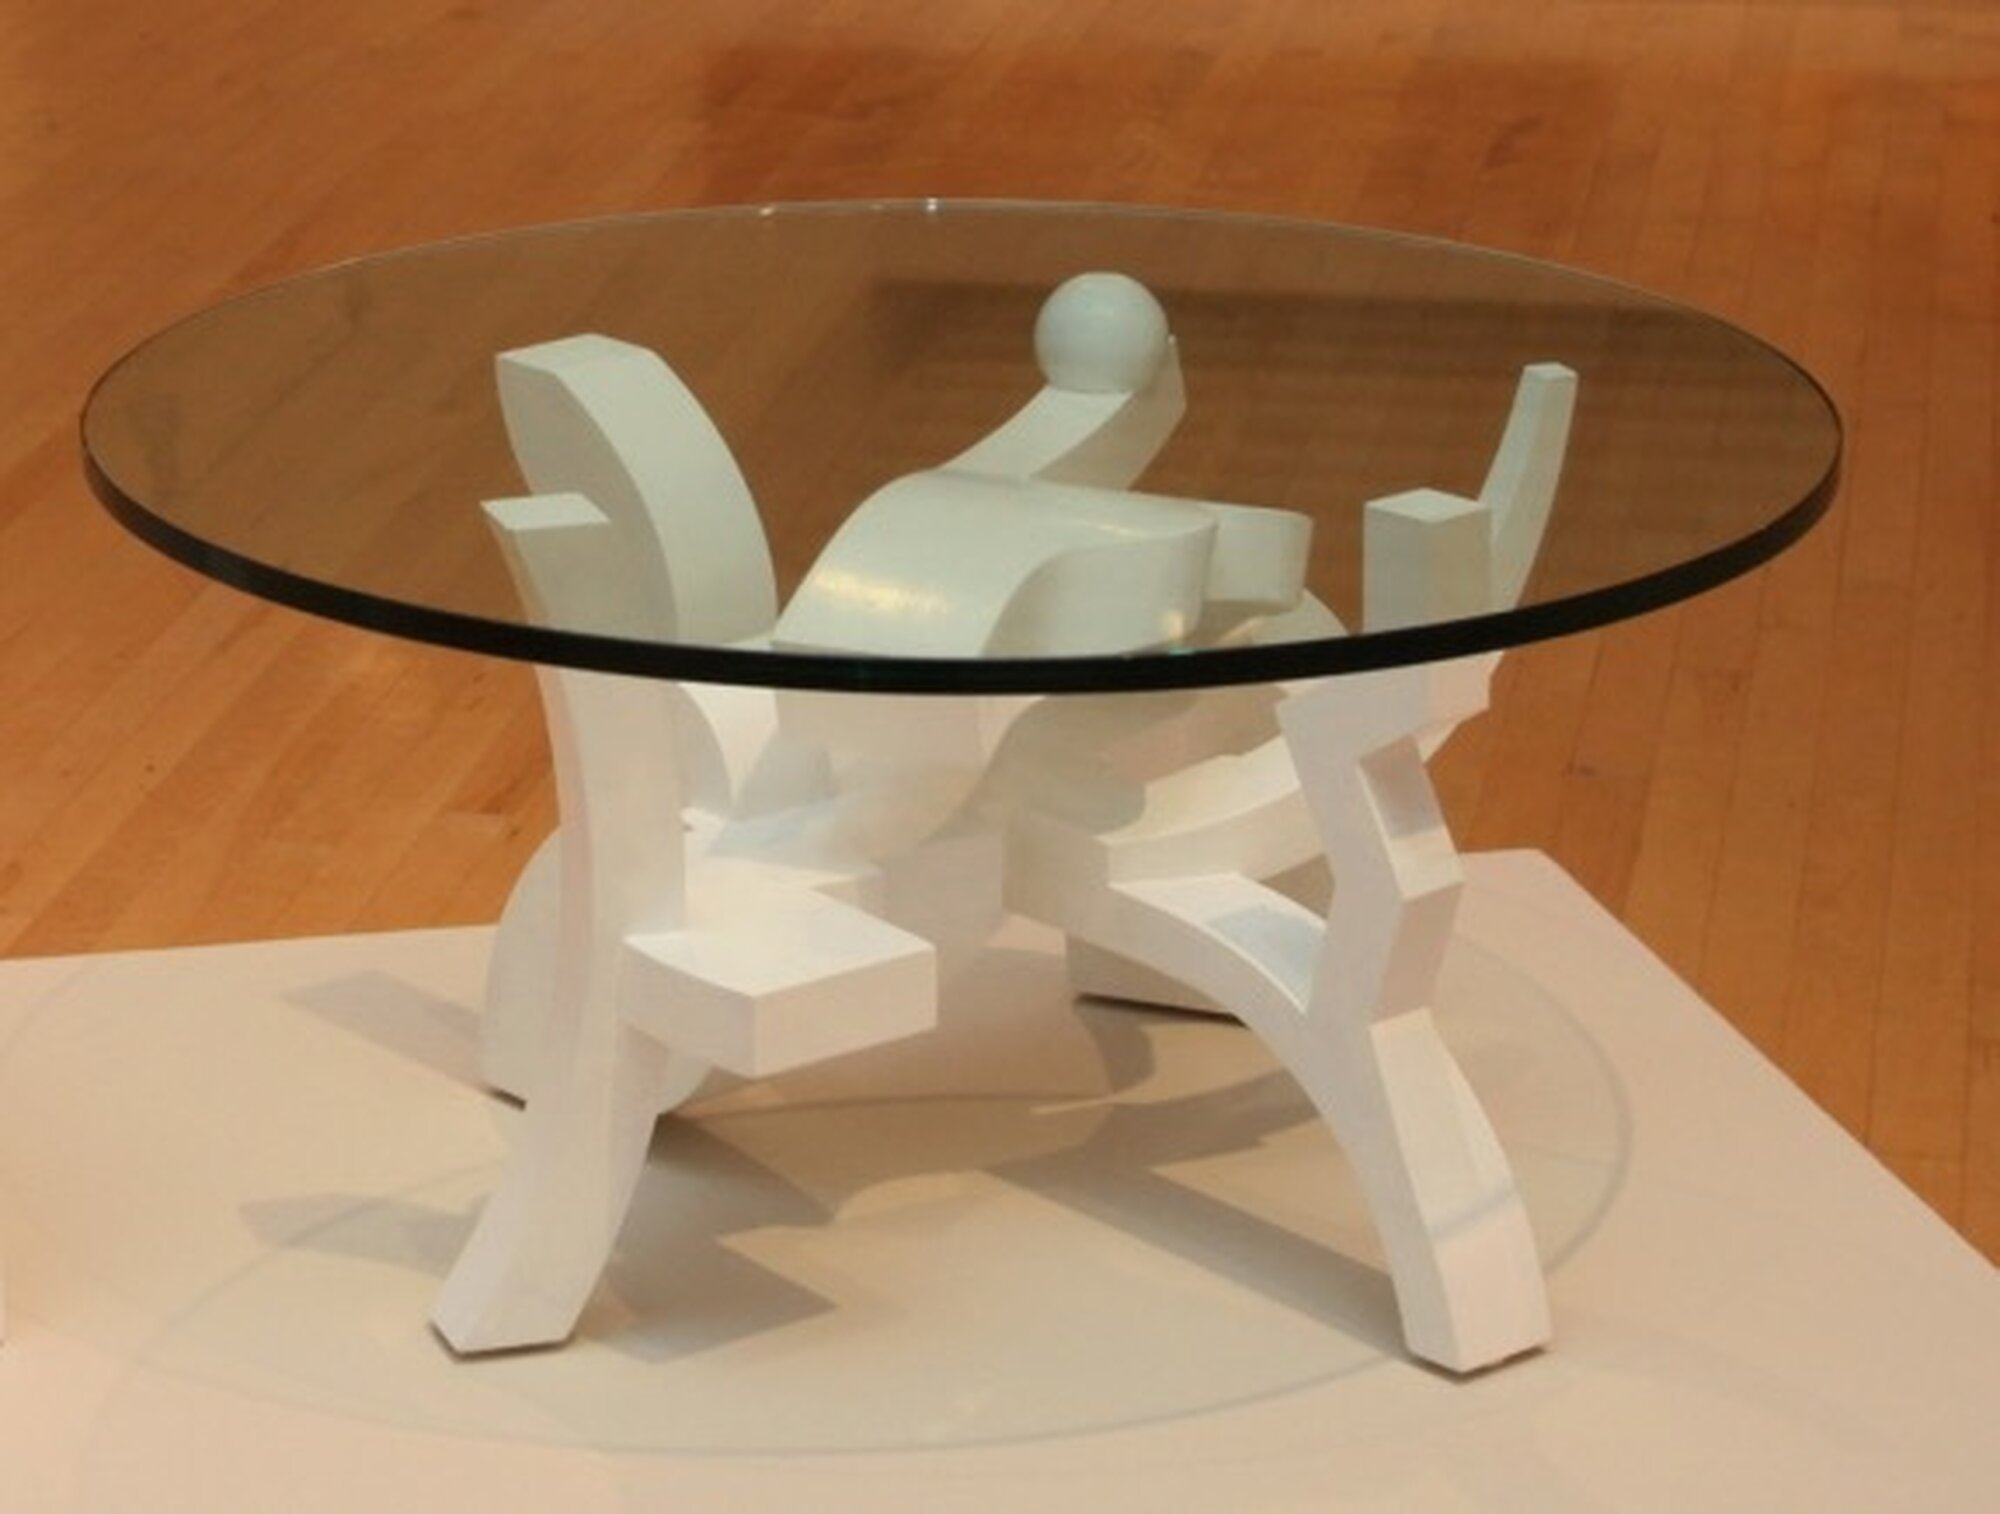 GKB White Glass Table